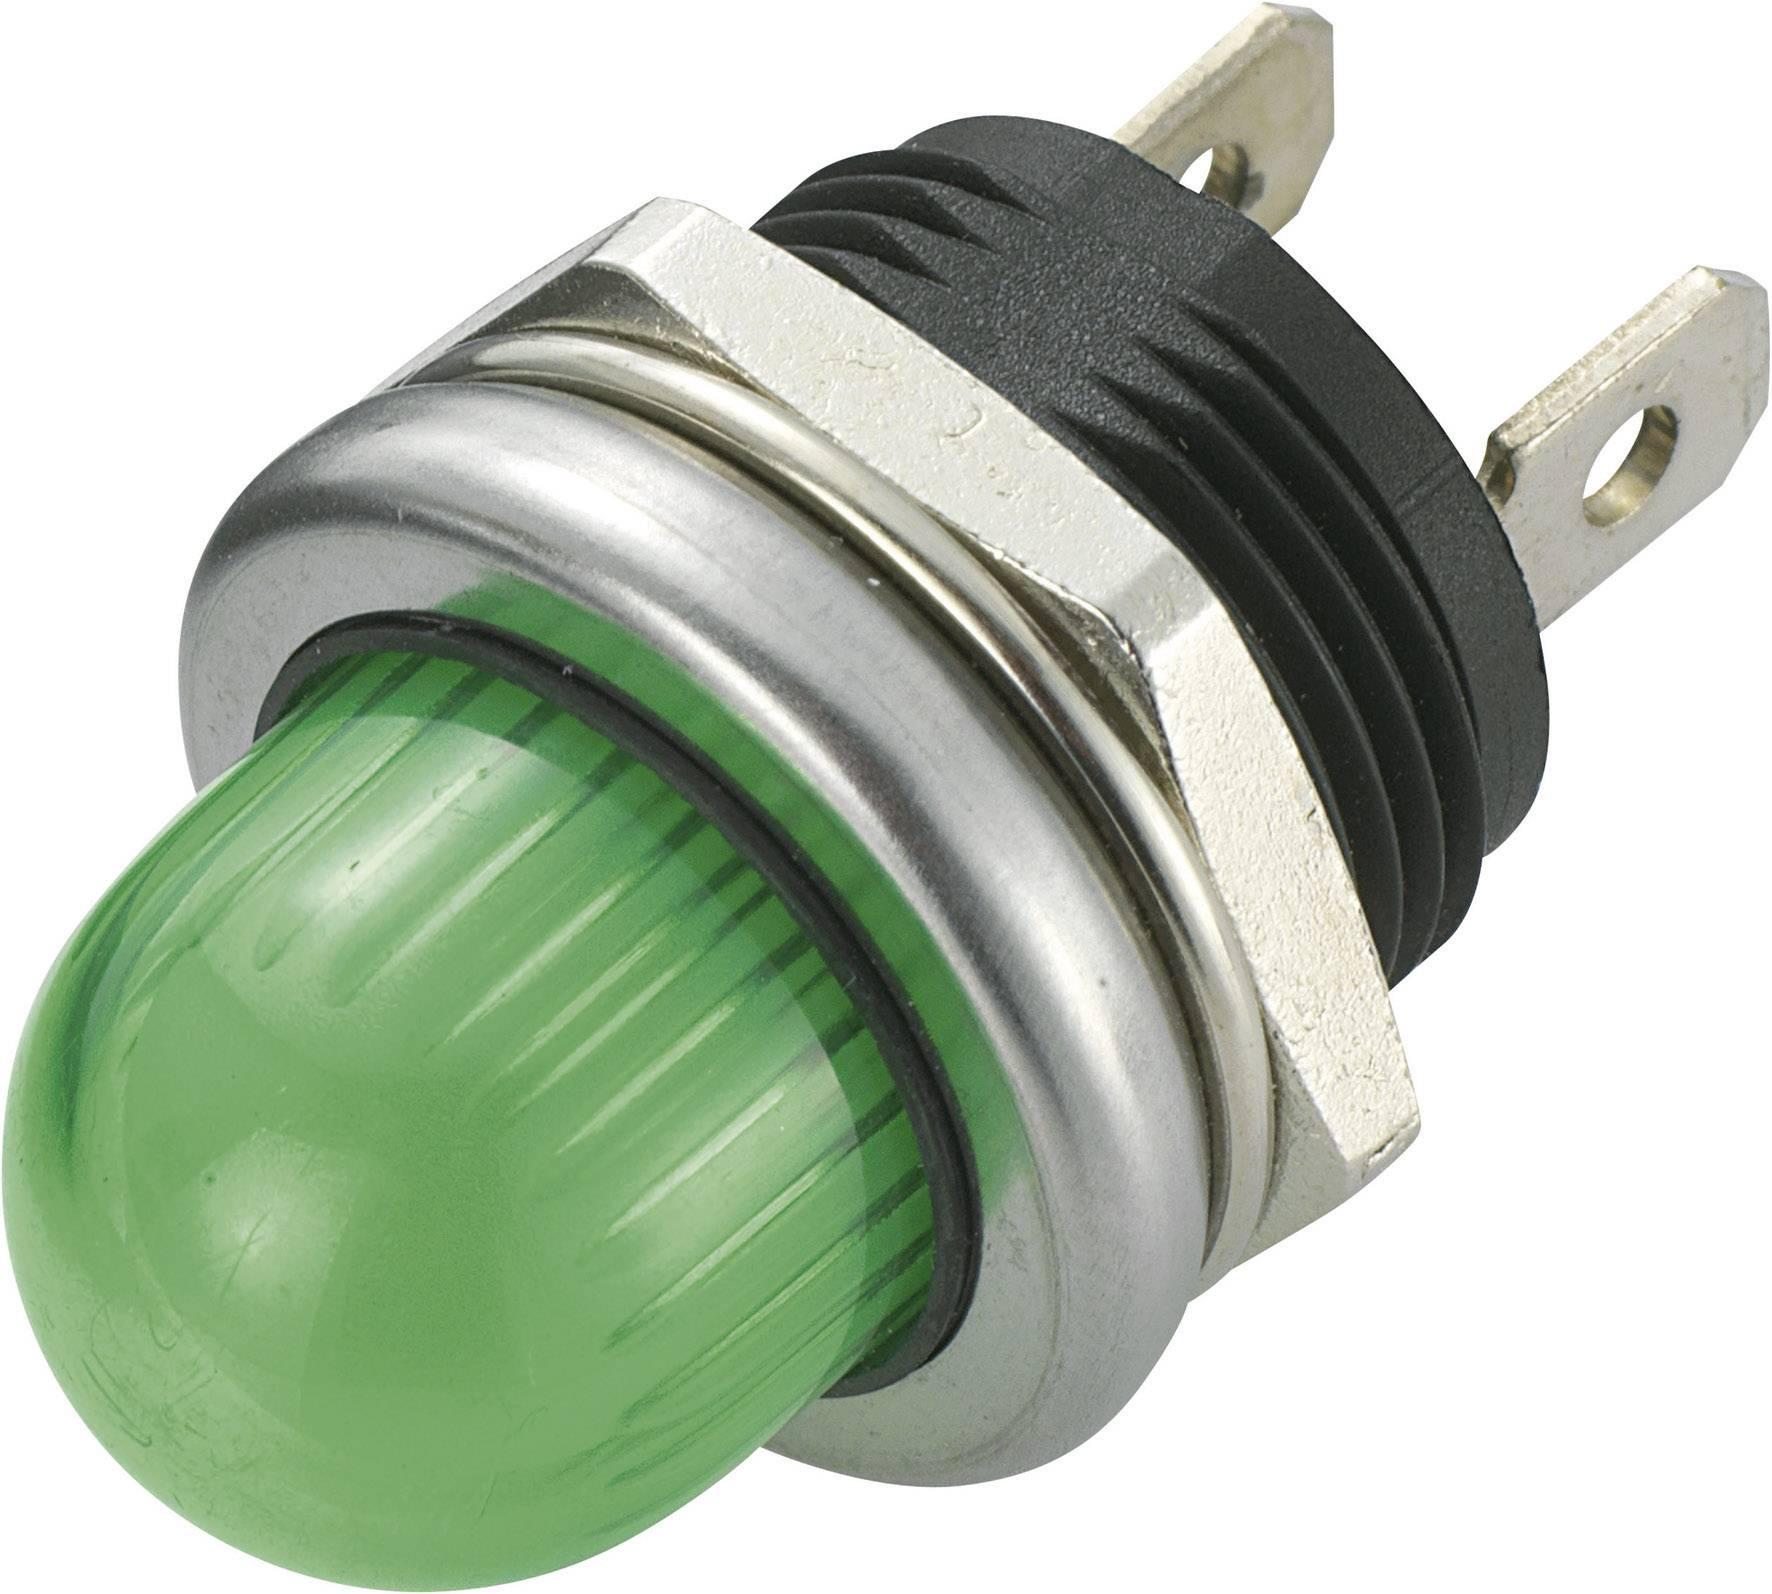 LED signálka SCI R9-105L1-02-WGG4, 12 V/DC, zelená